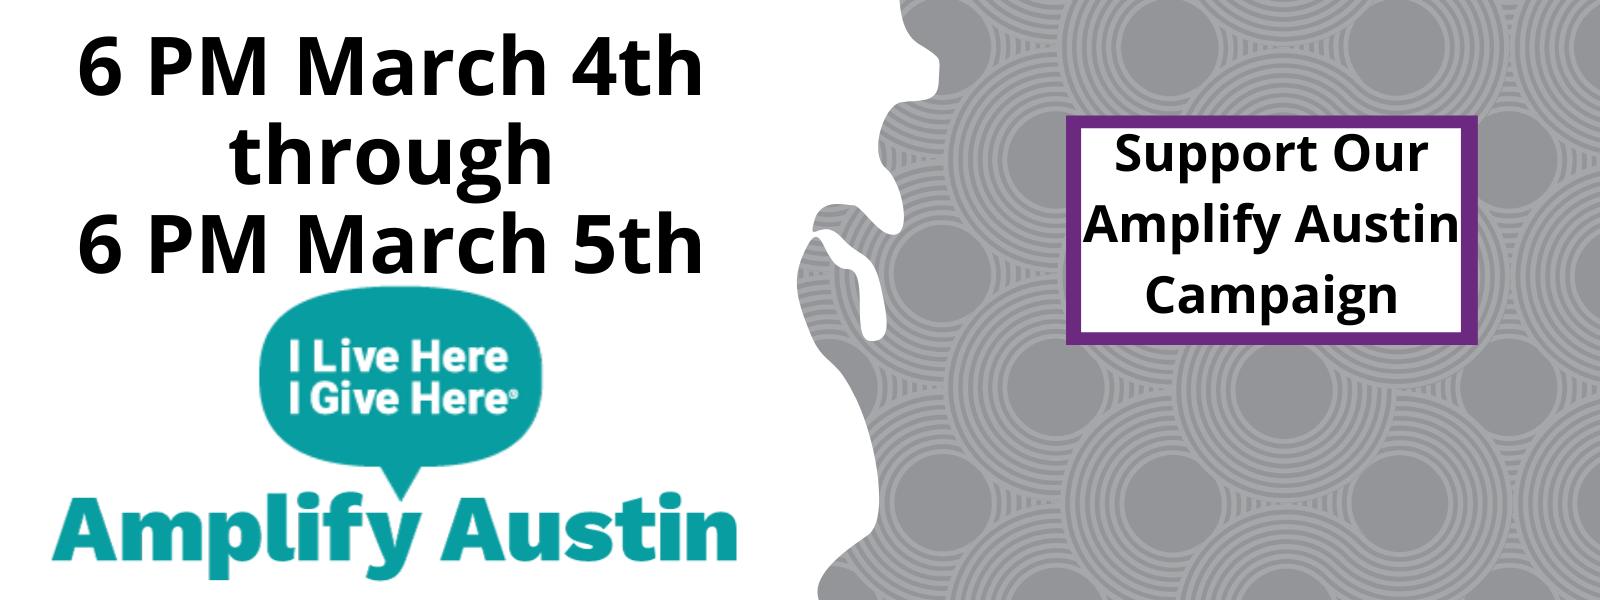 Amplify Austin 2021